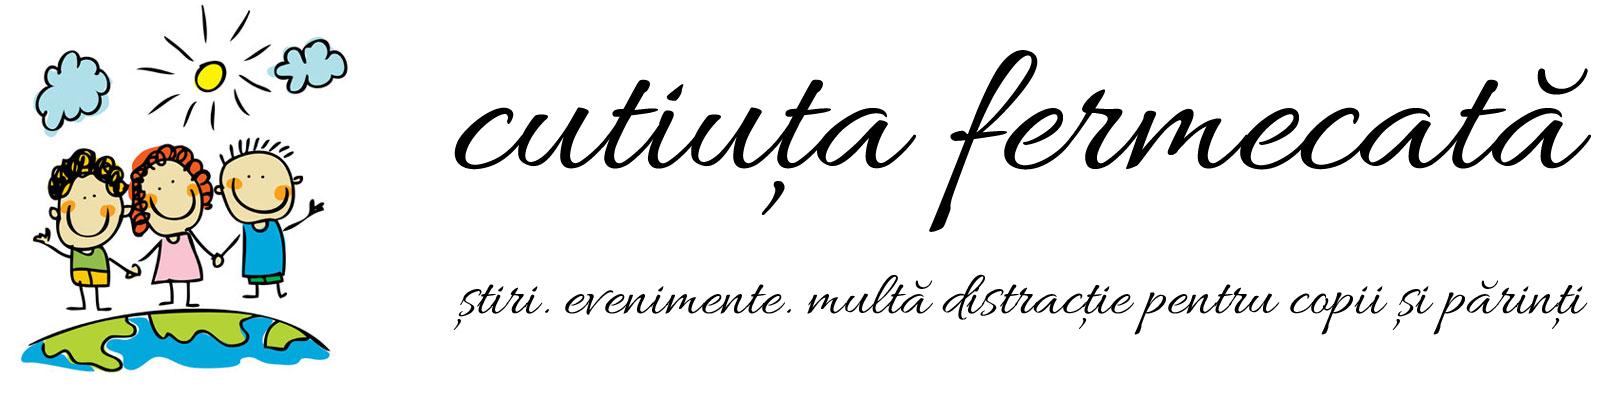 Cutiuta Fermecata Logo